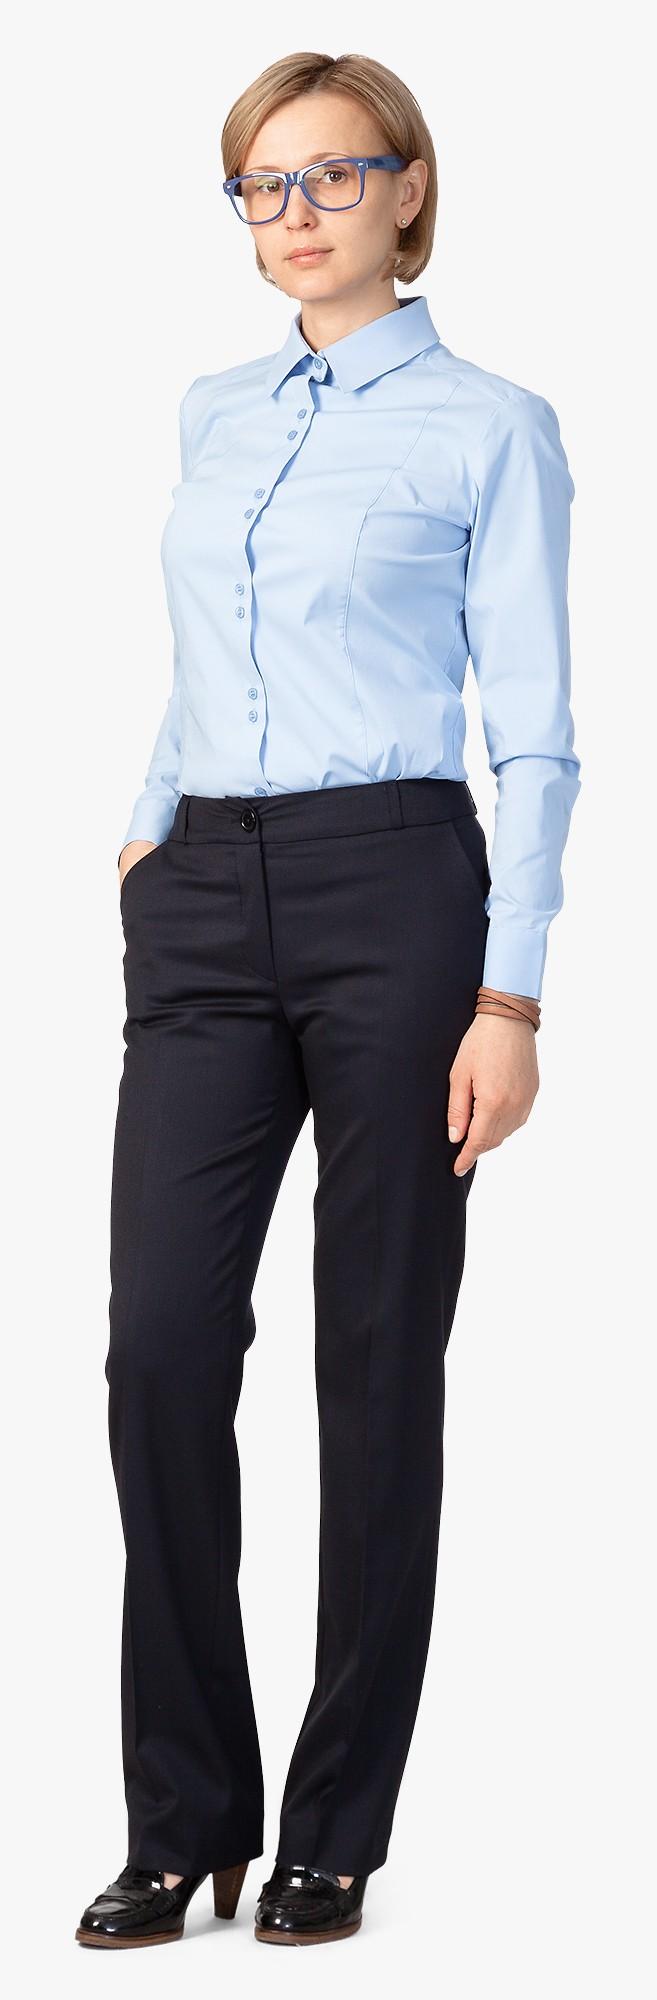 1.005 košile SLIM FIT, dl.rukáv, modrá